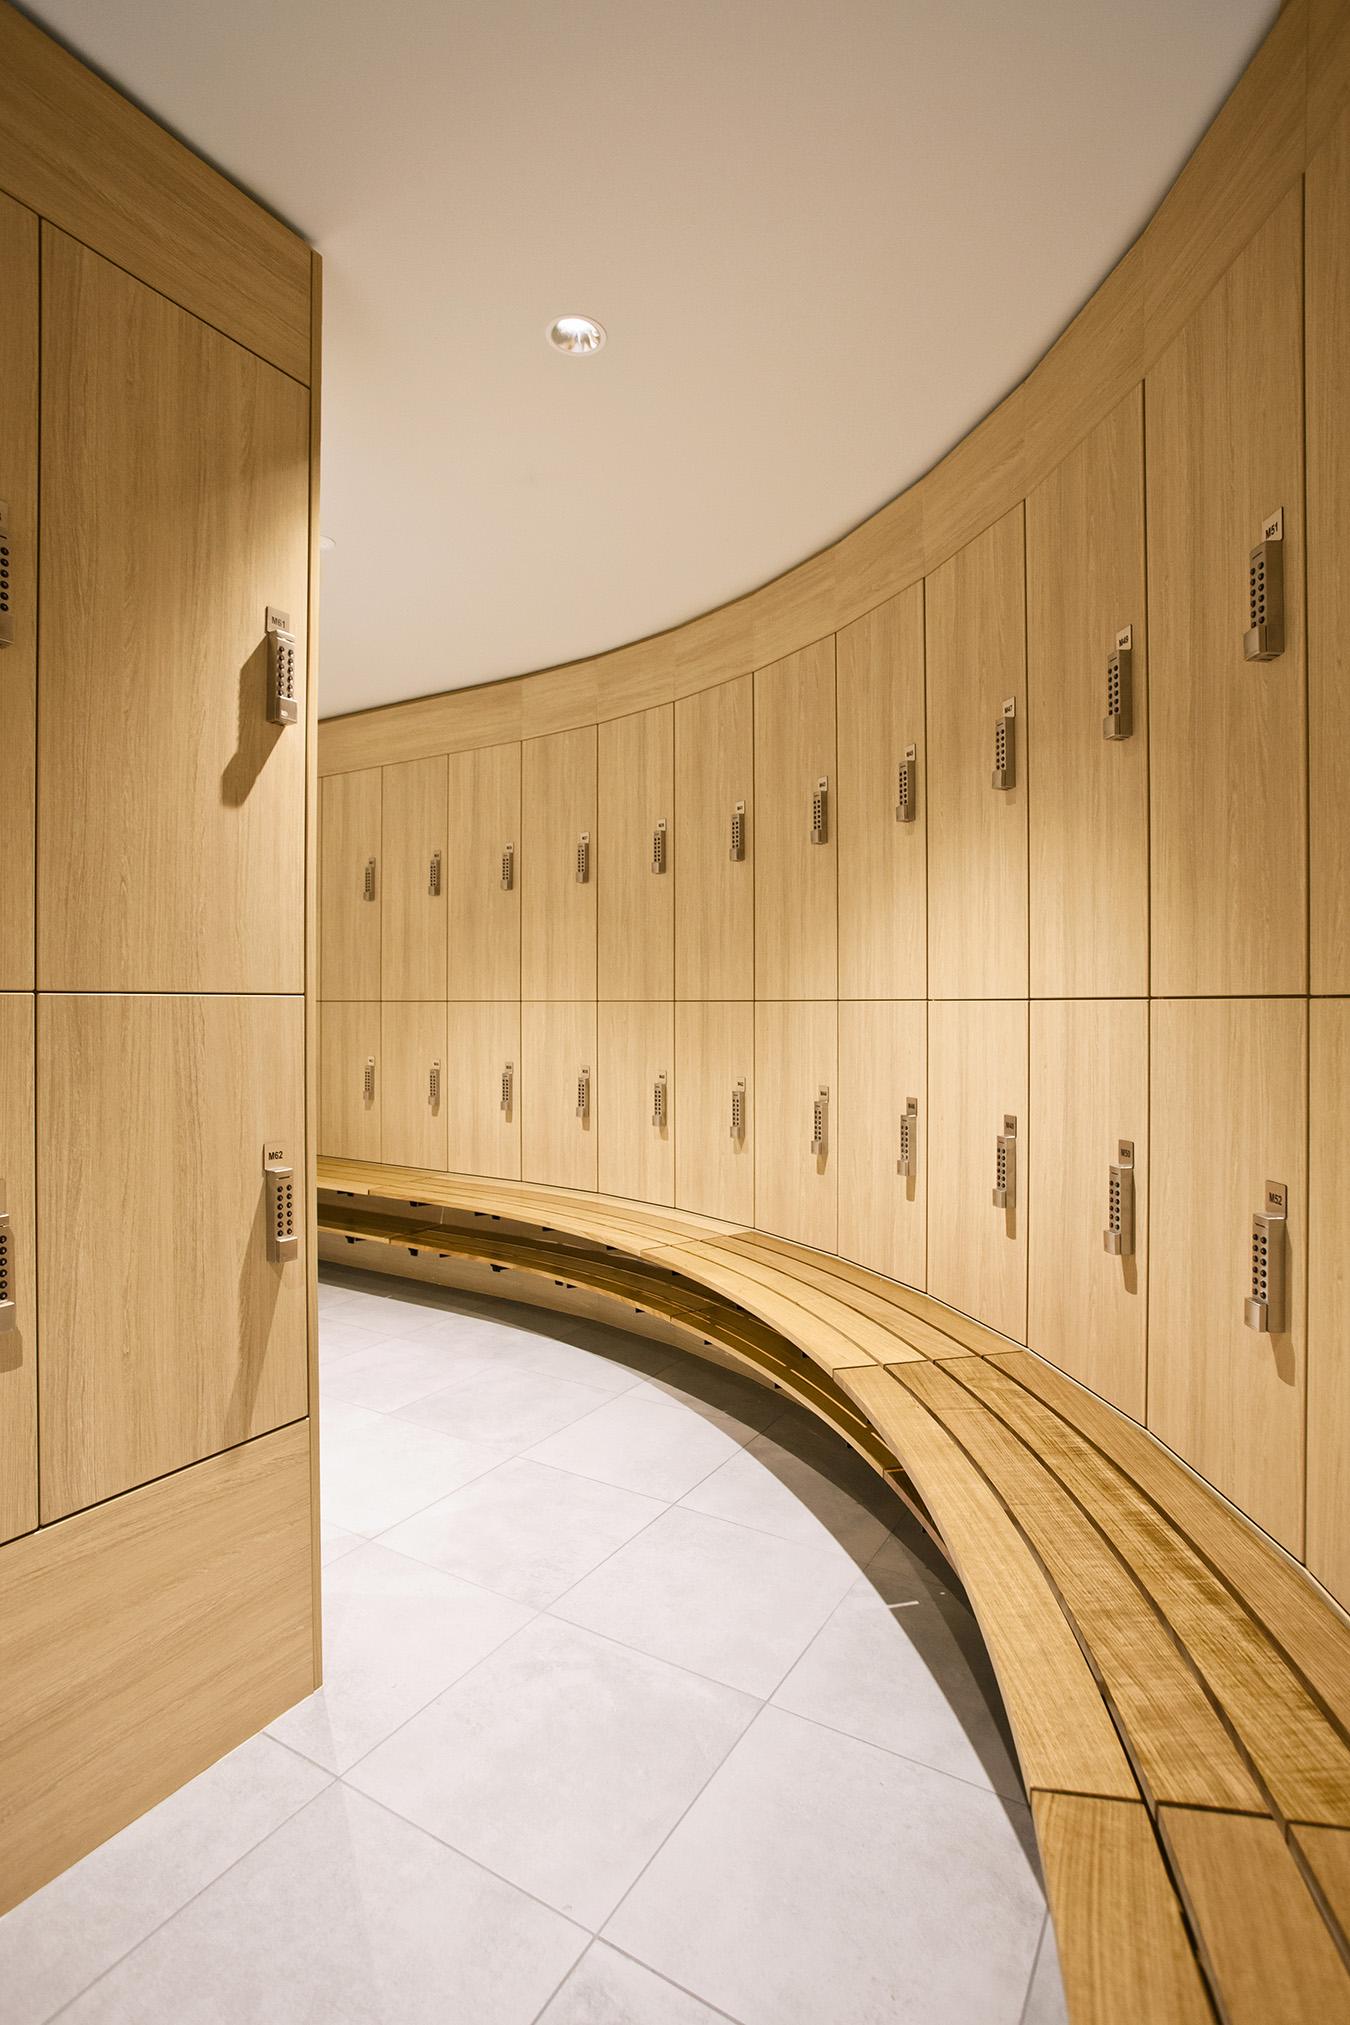 Innovation Place lockers